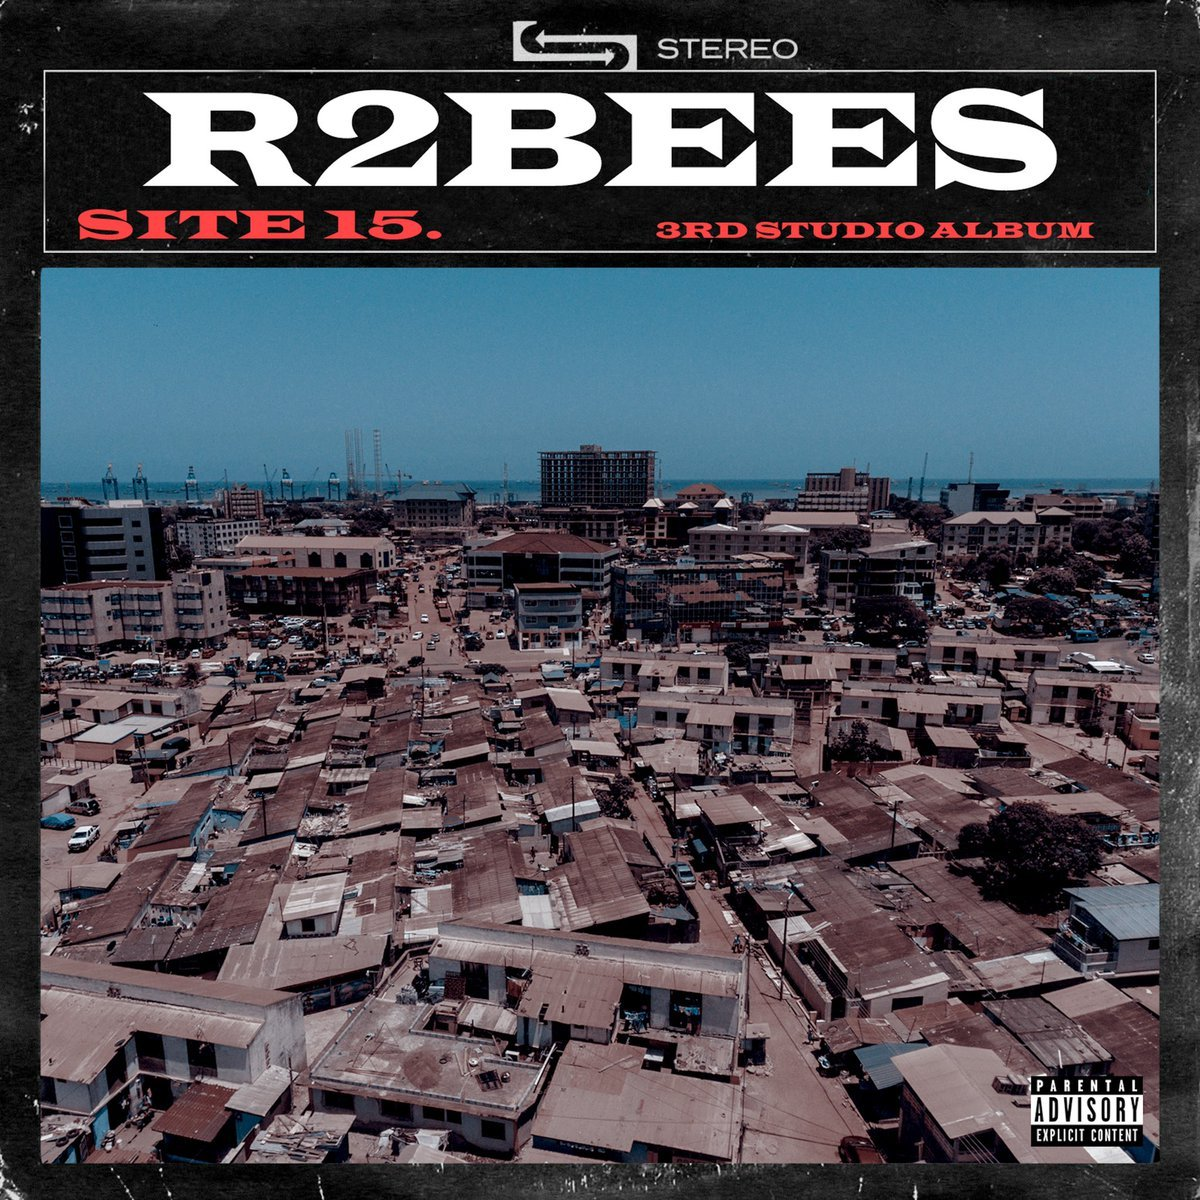 r2bees-Site-15-album-2019-ghana.jpg